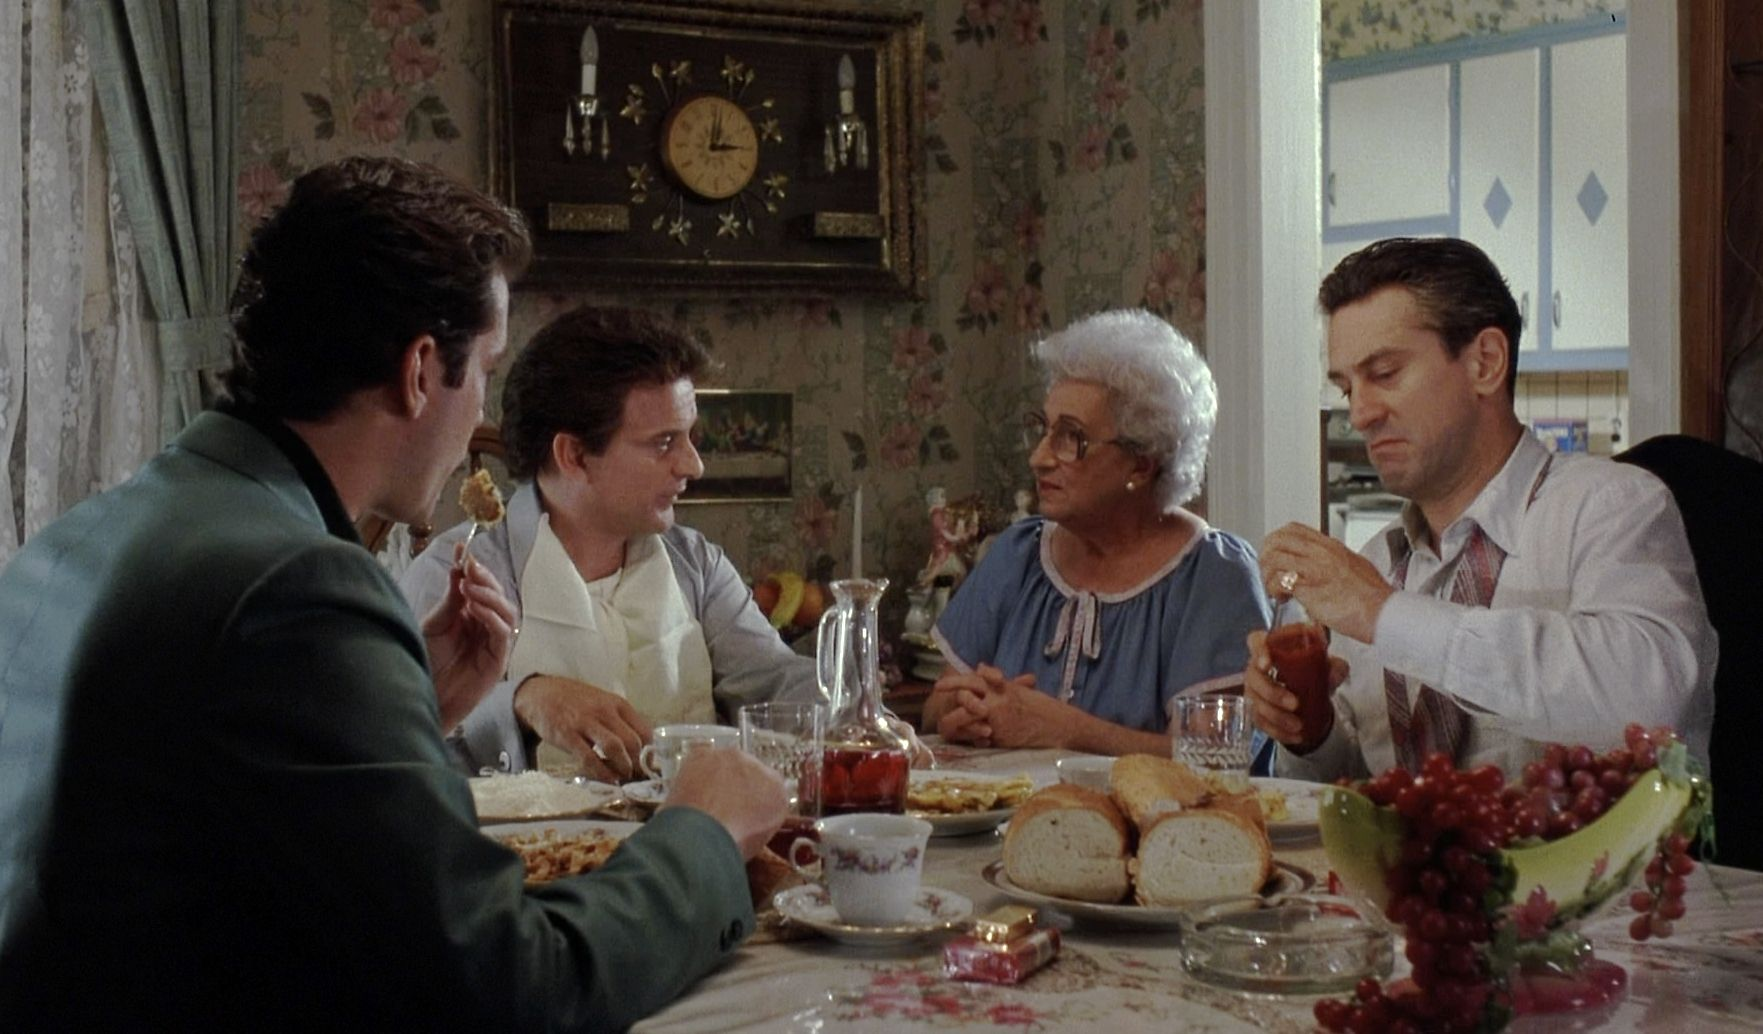 Quei bravi ragazzi: De Niro, Pesci e Liotta